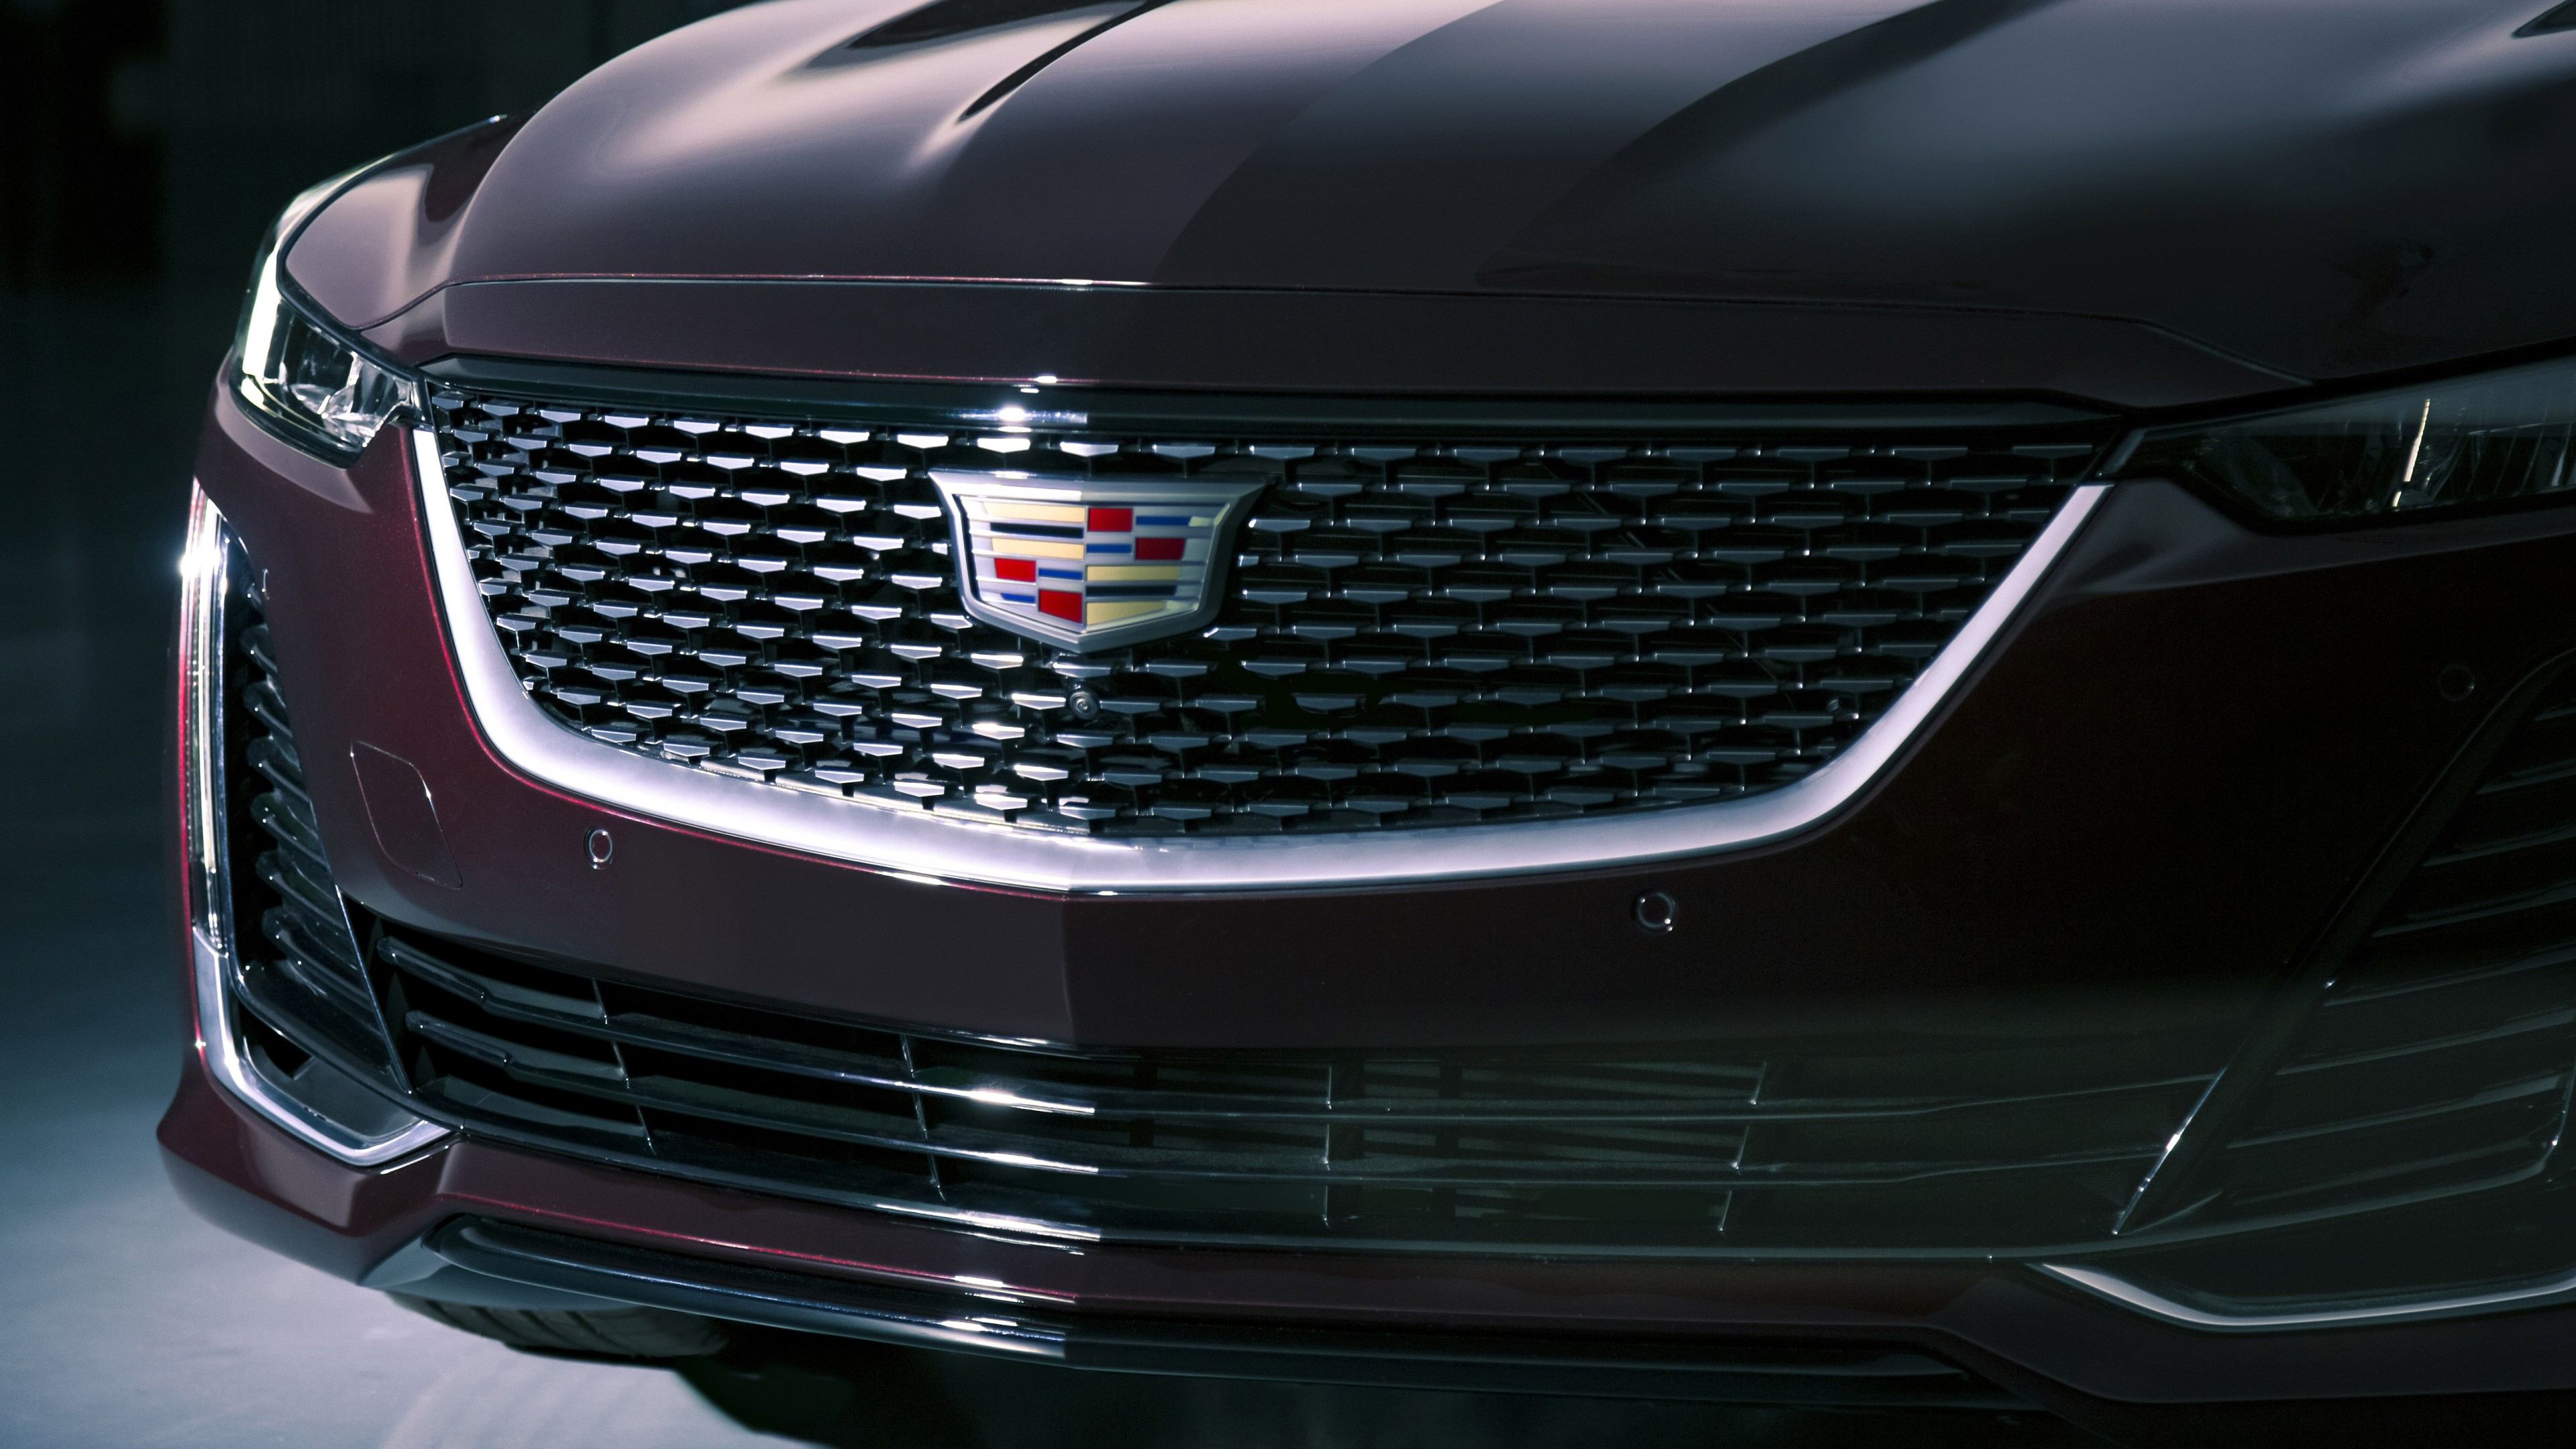 2020 Cadillac Ct5 Premium Luxury 5k 2 Wallpaper Hd Car